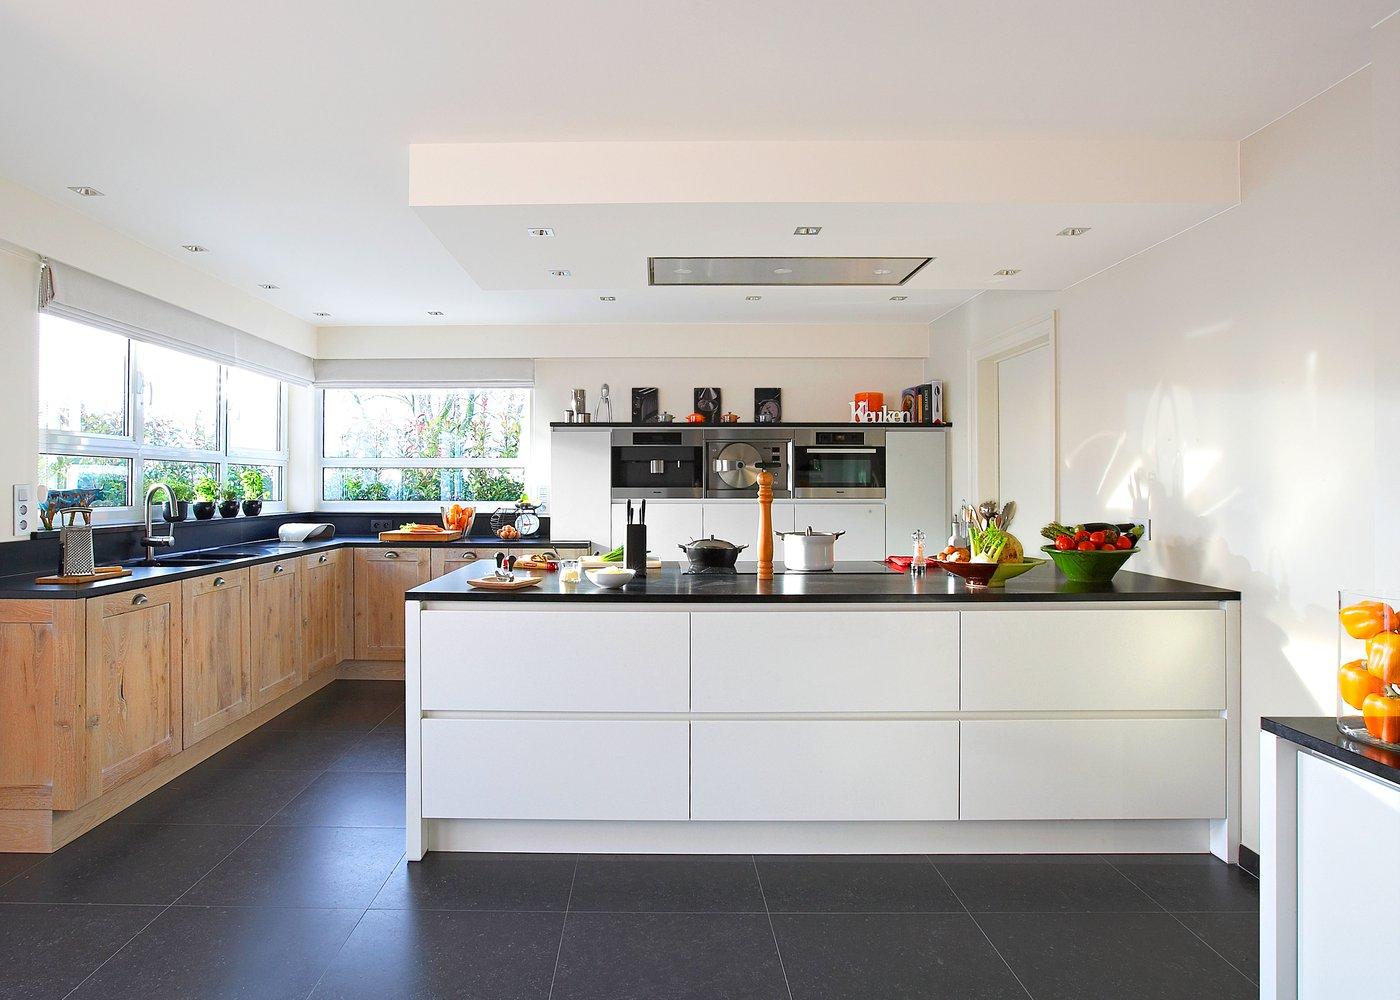 Moderne keuken in landelijk jasje - Model Savannah / Design